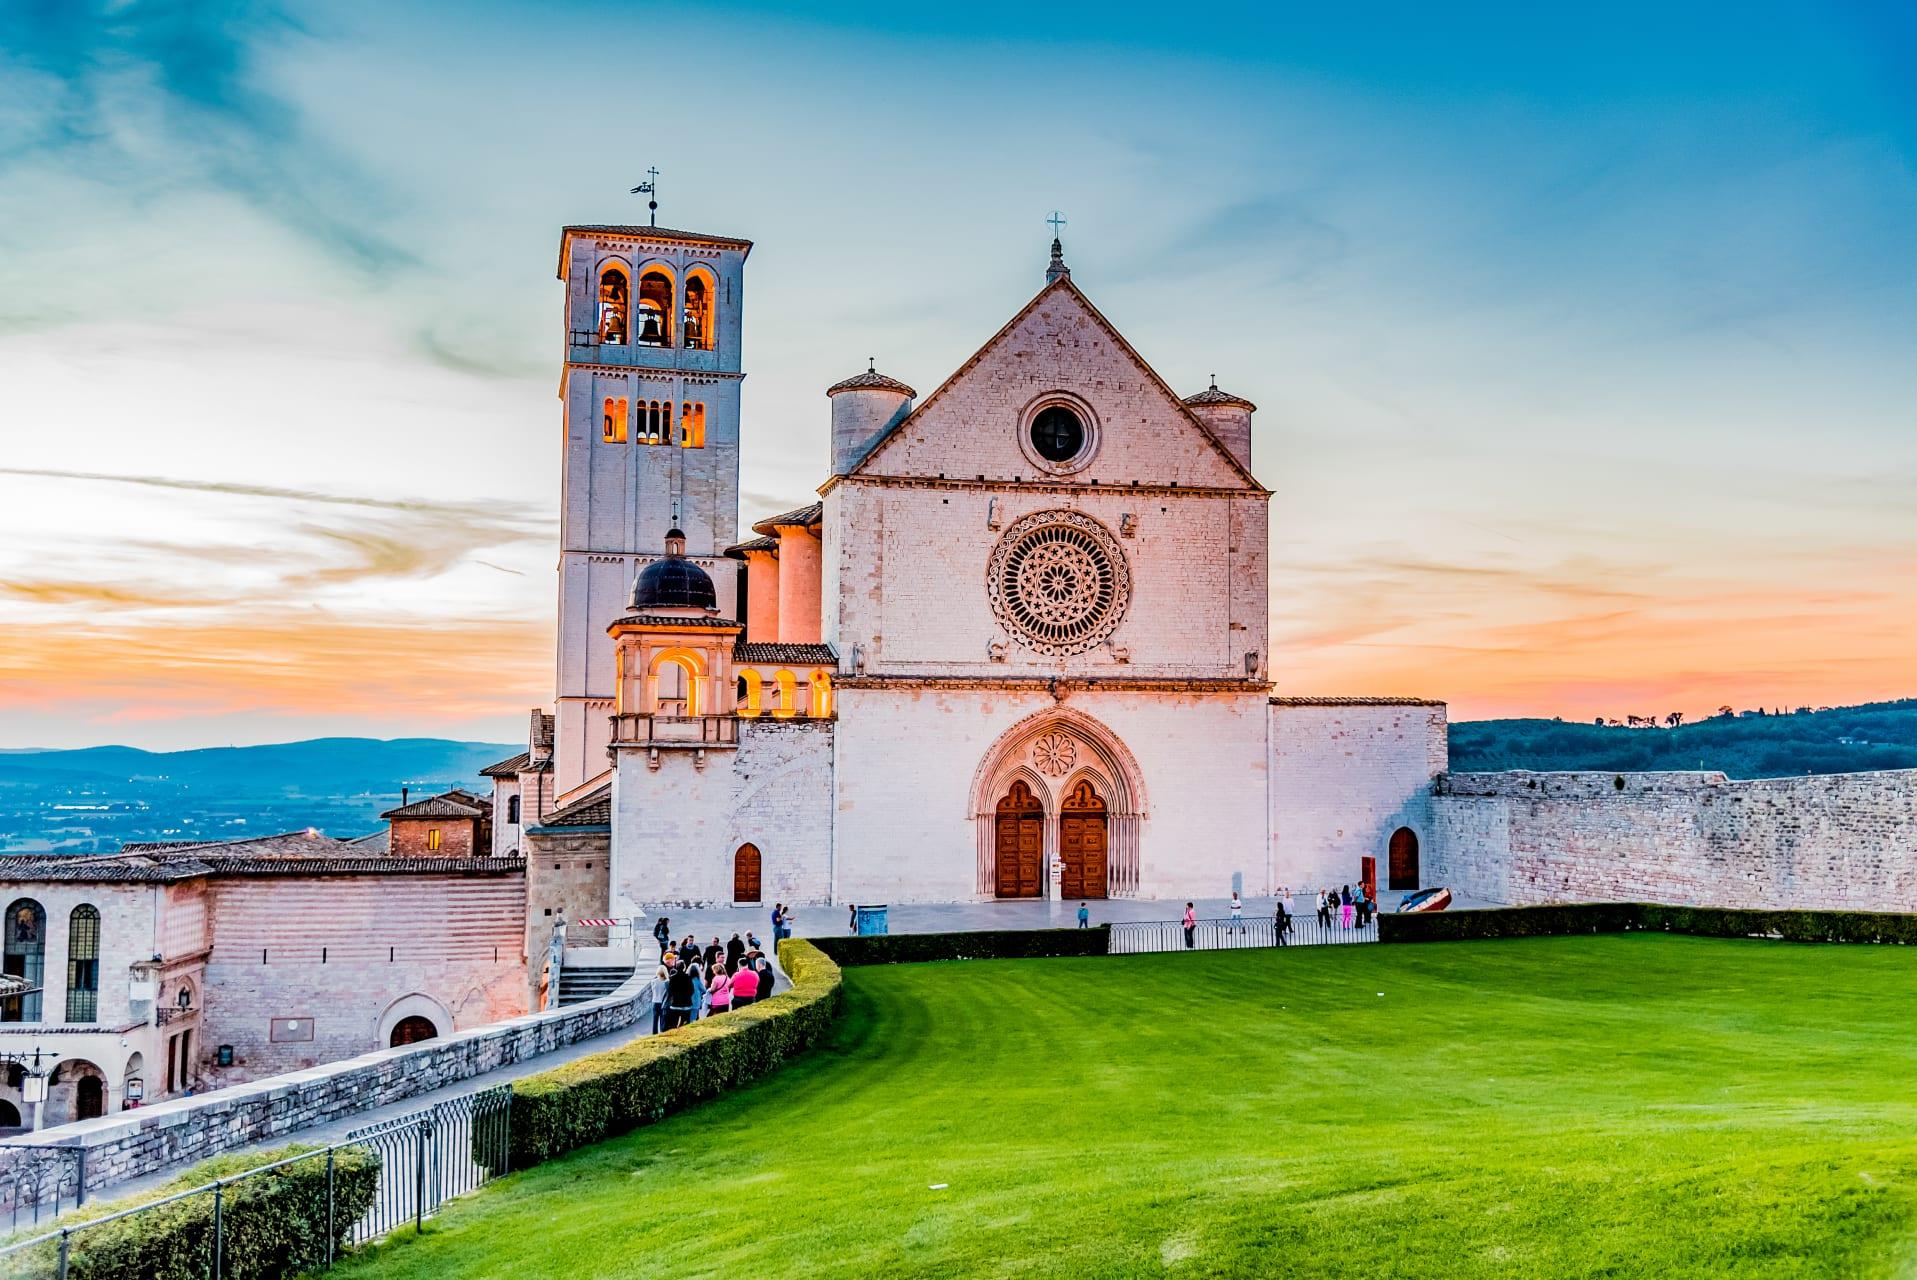 Assisi - Basilica of Saint Francis